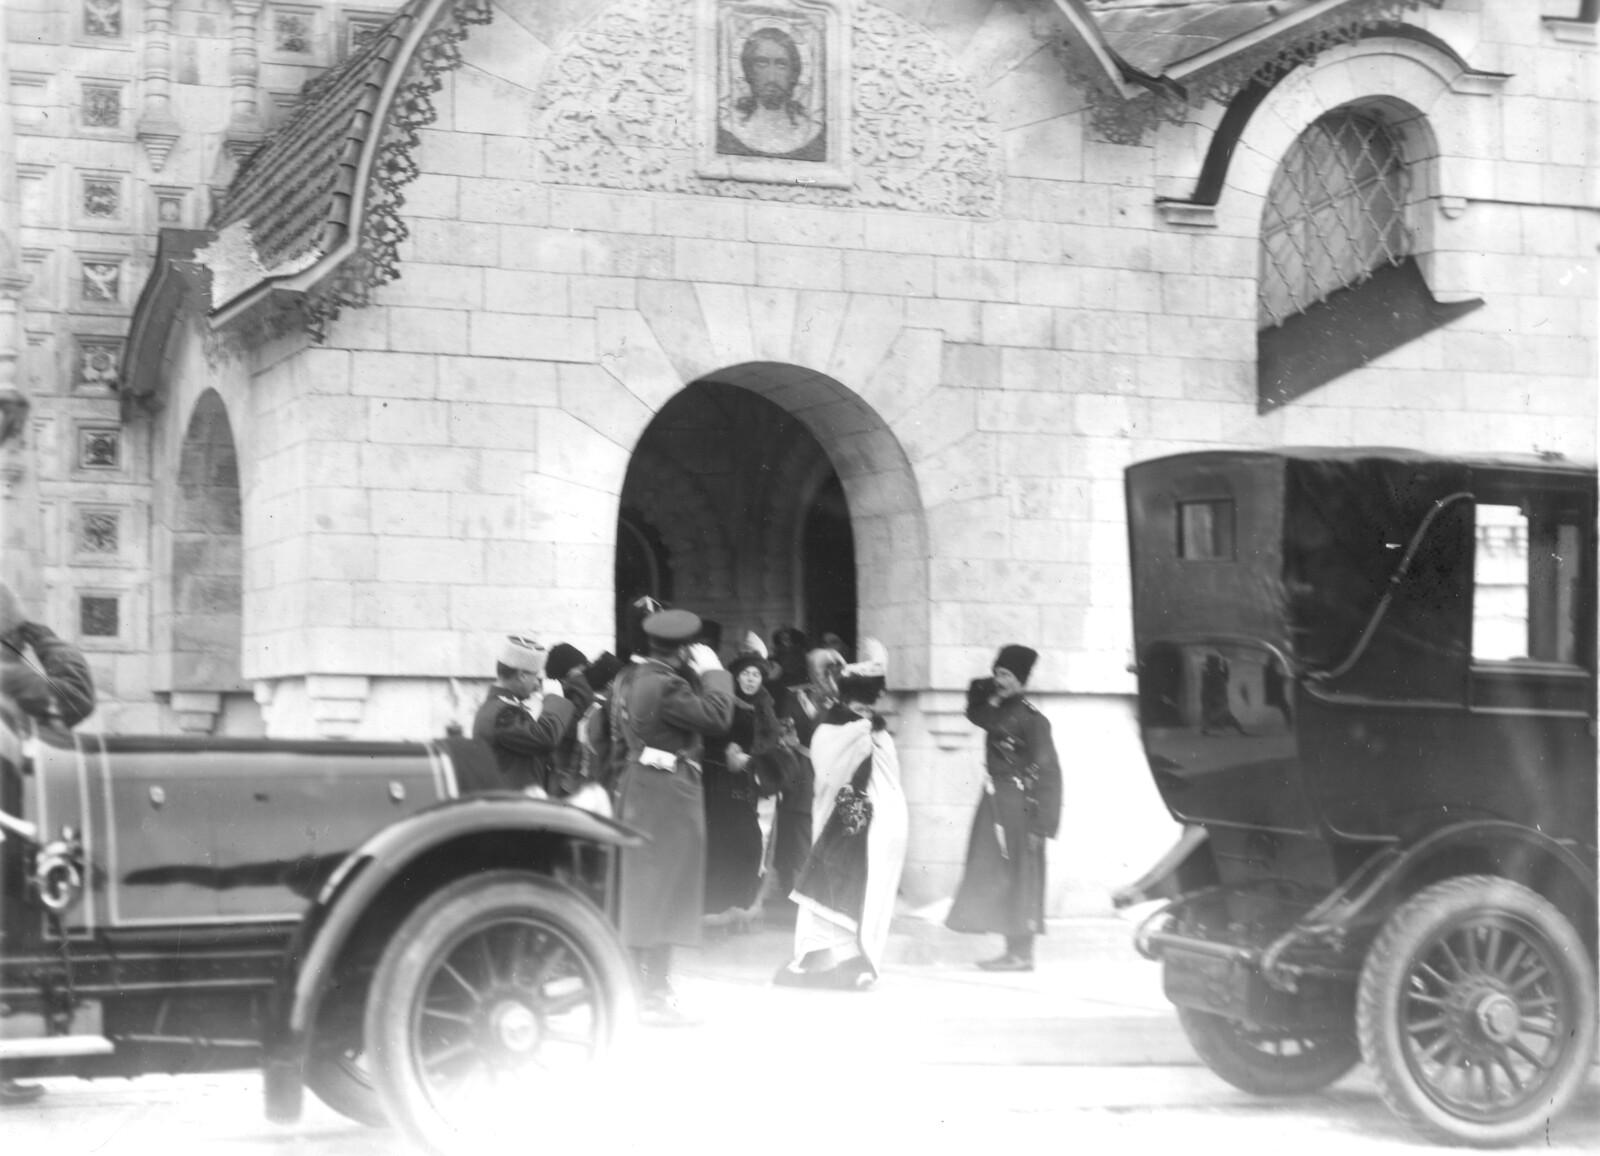 17. 1914. Освящение Феодоровского собора. Отъезд членов царской фамилии.